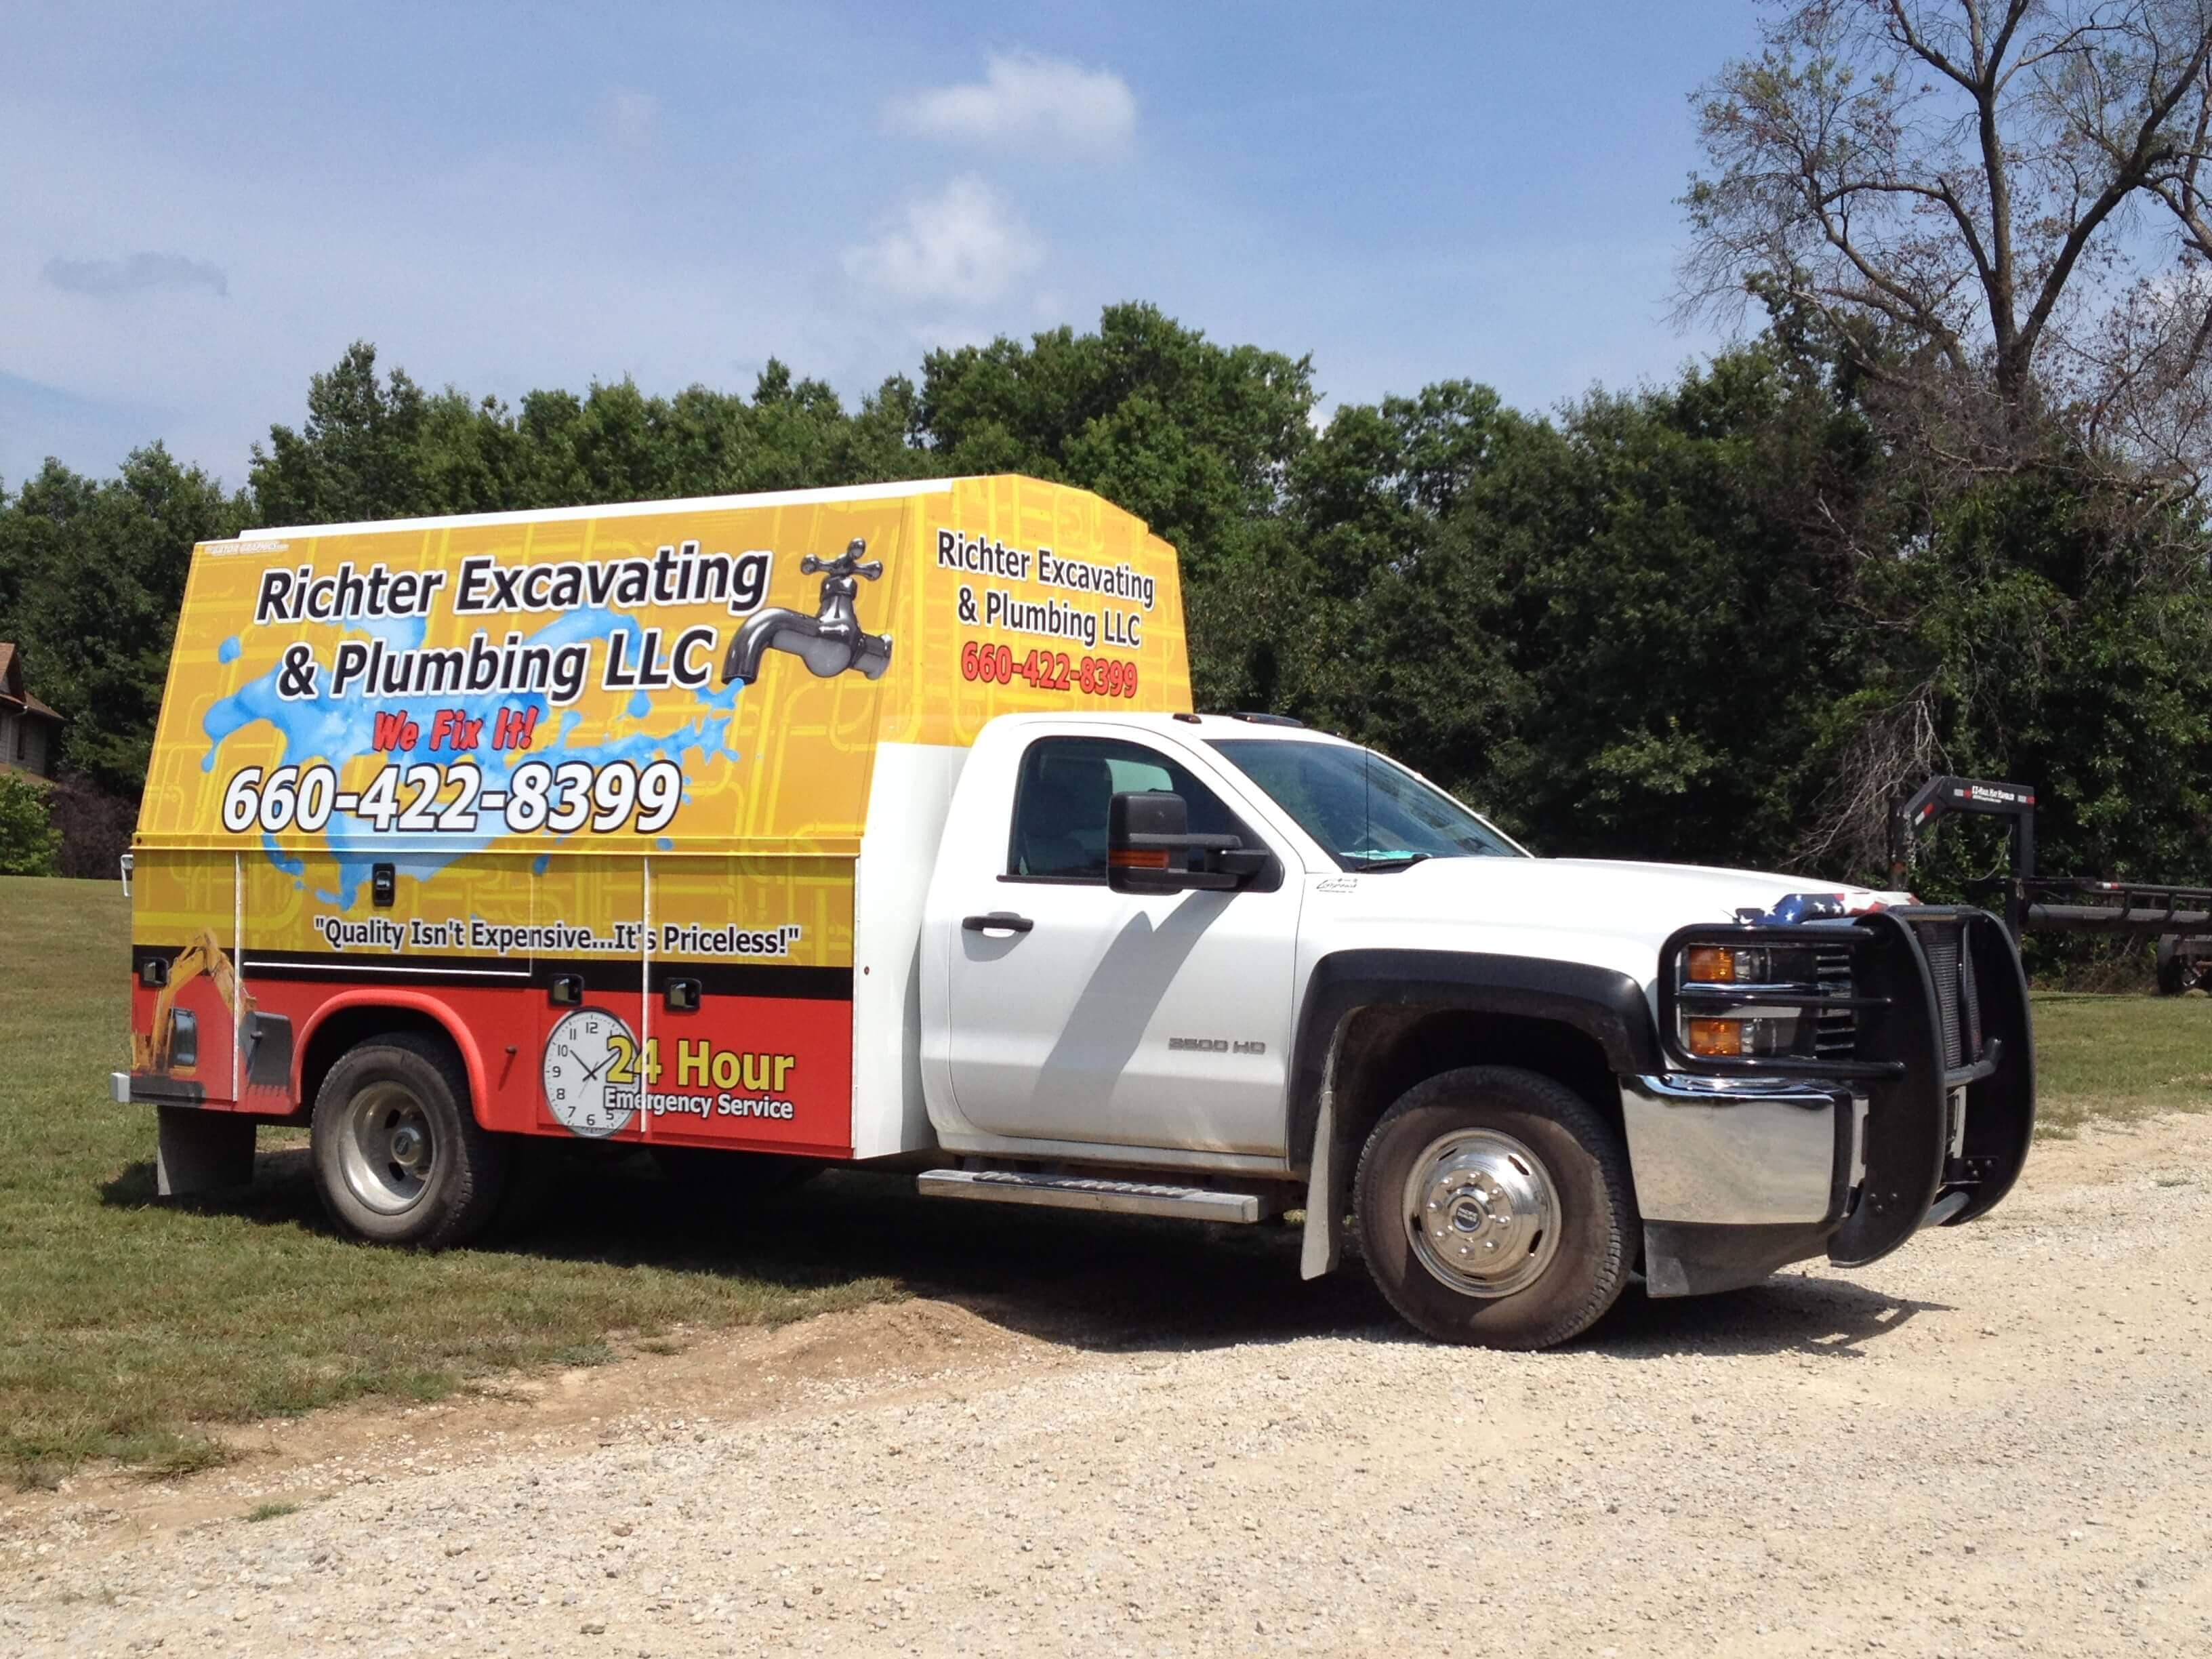 Richter Excavating & Plumbing LLC image 3